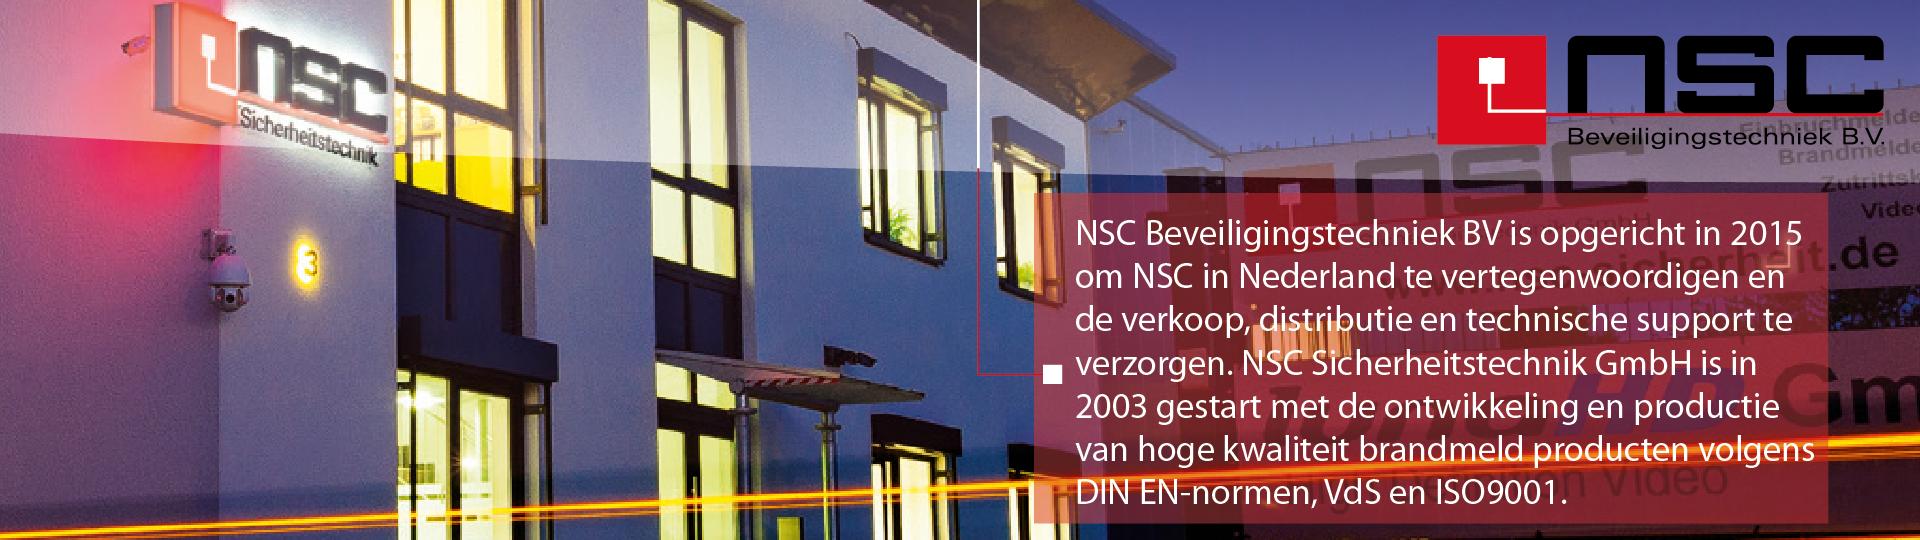 NSC header